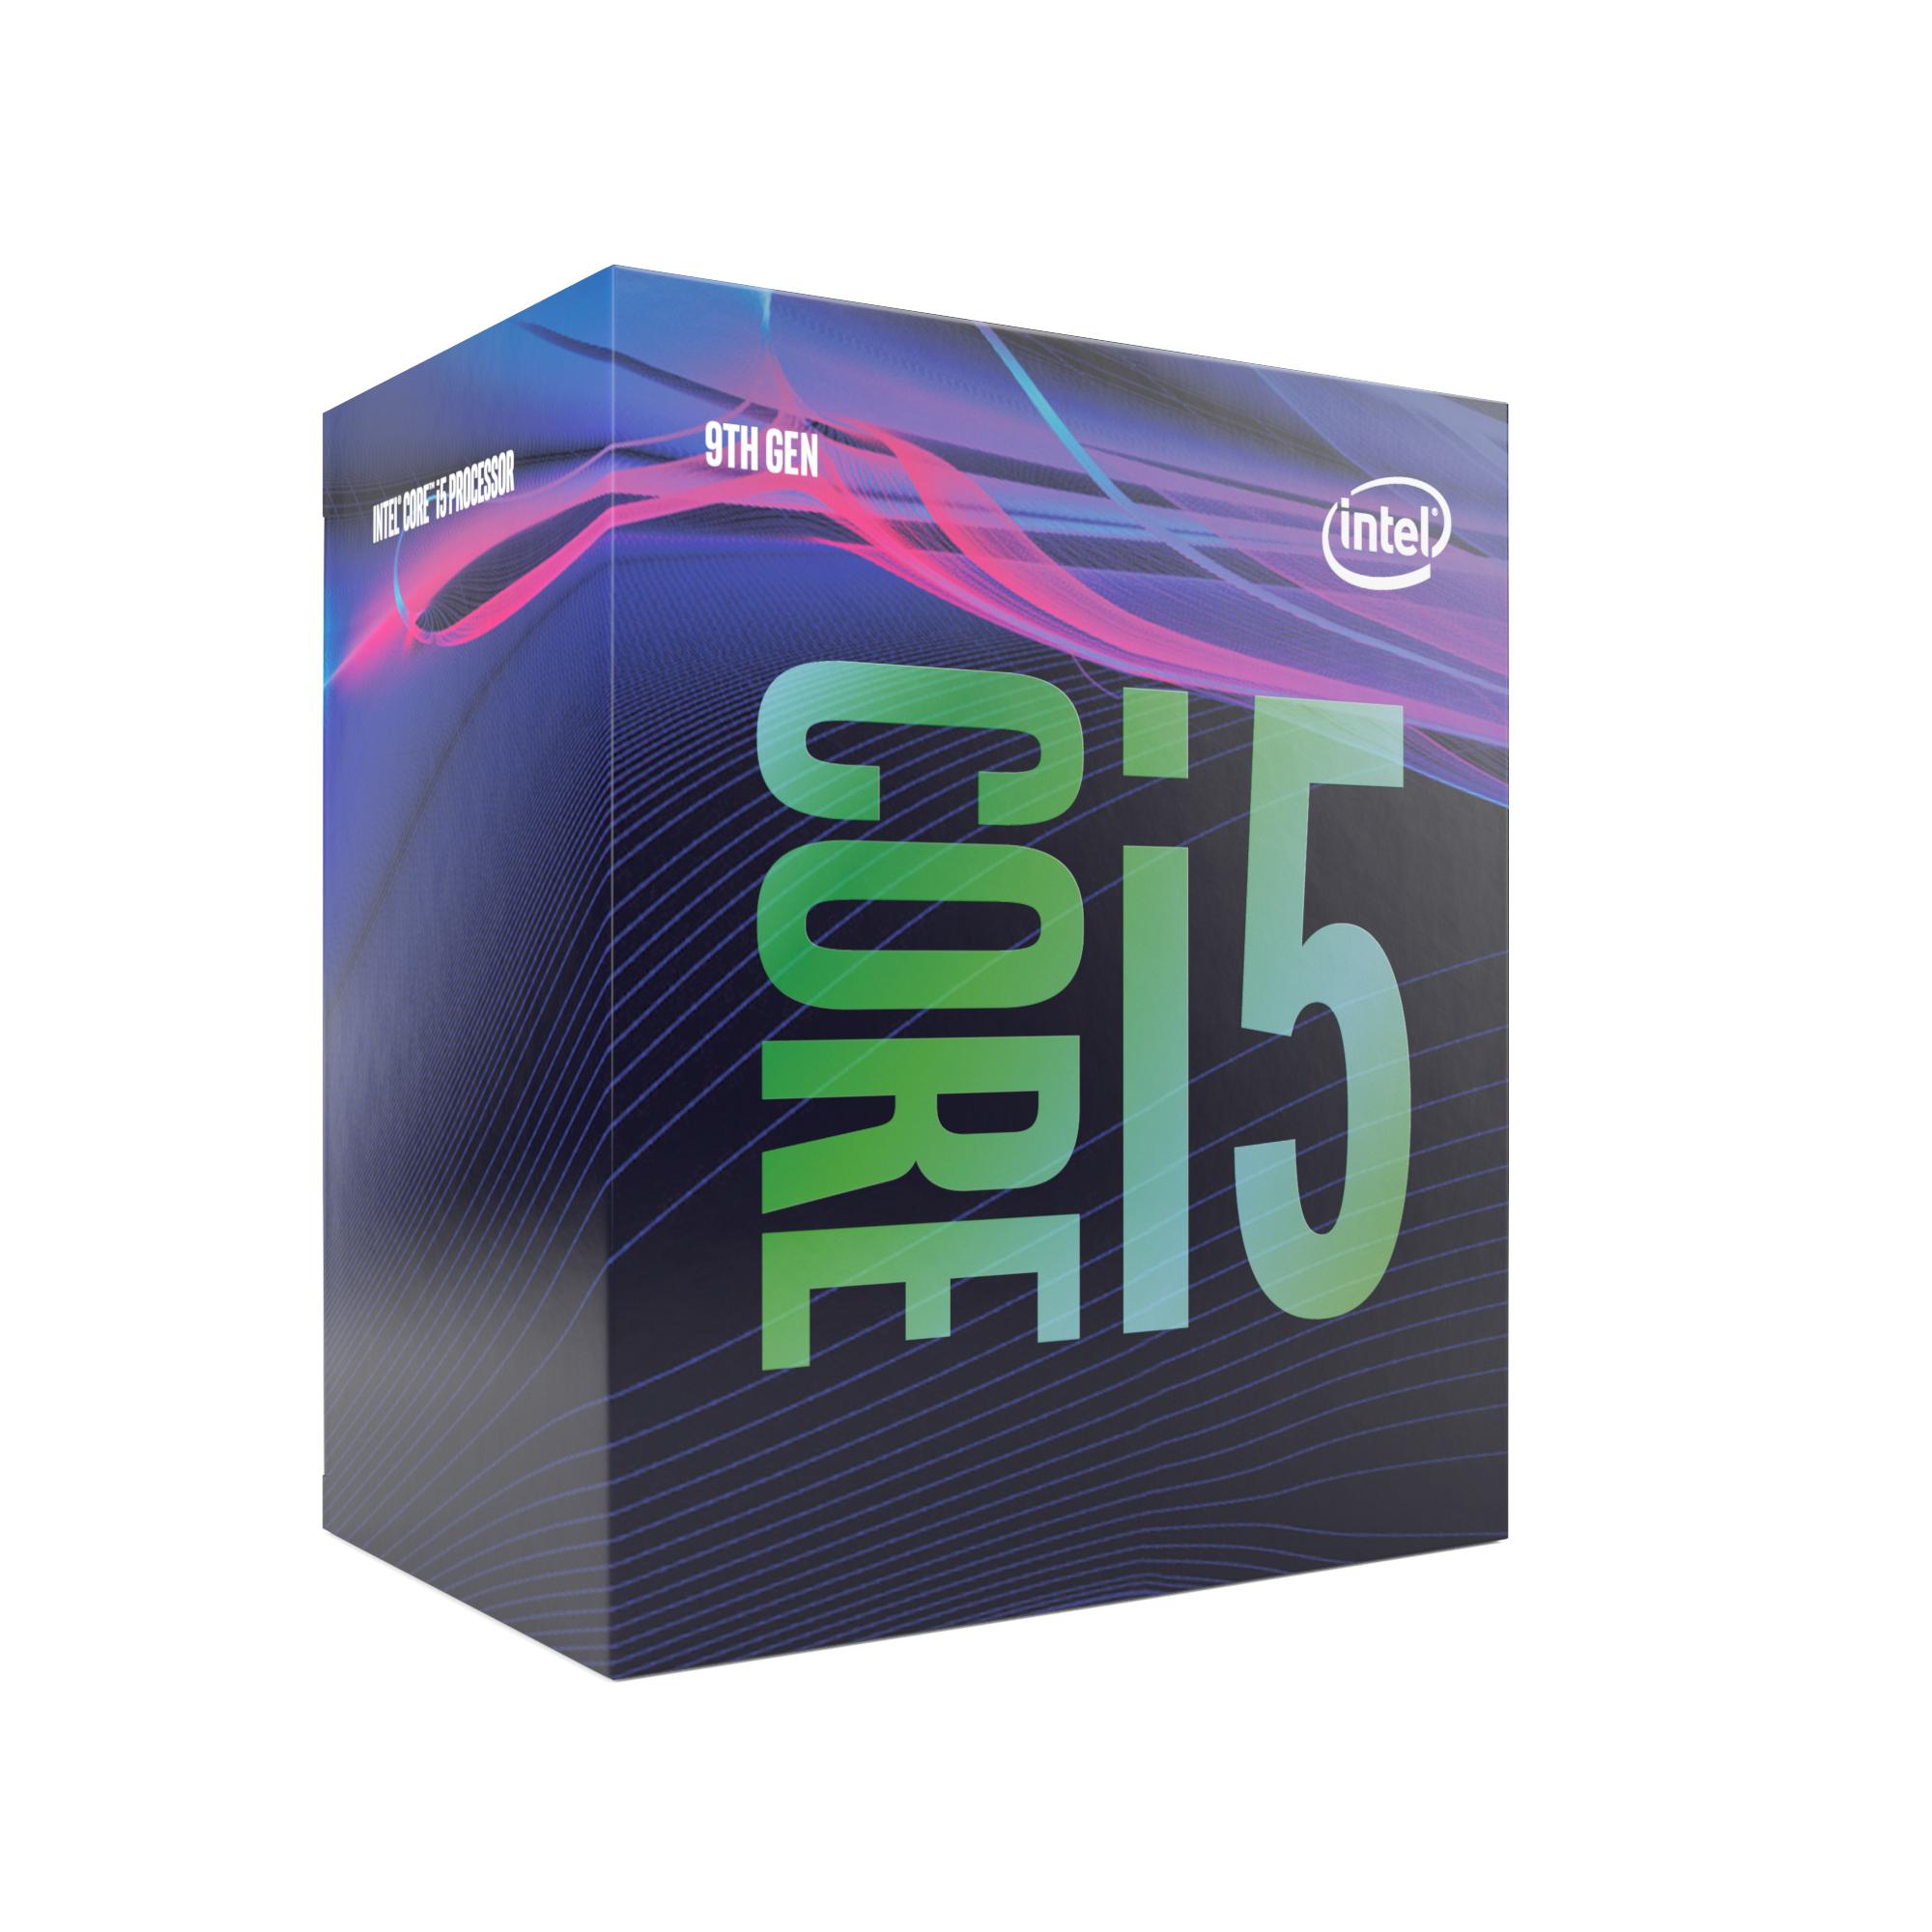 Intel Core i5-9400F (6 Core) 2.9GHz Processor - Walmart.com  $101 $101